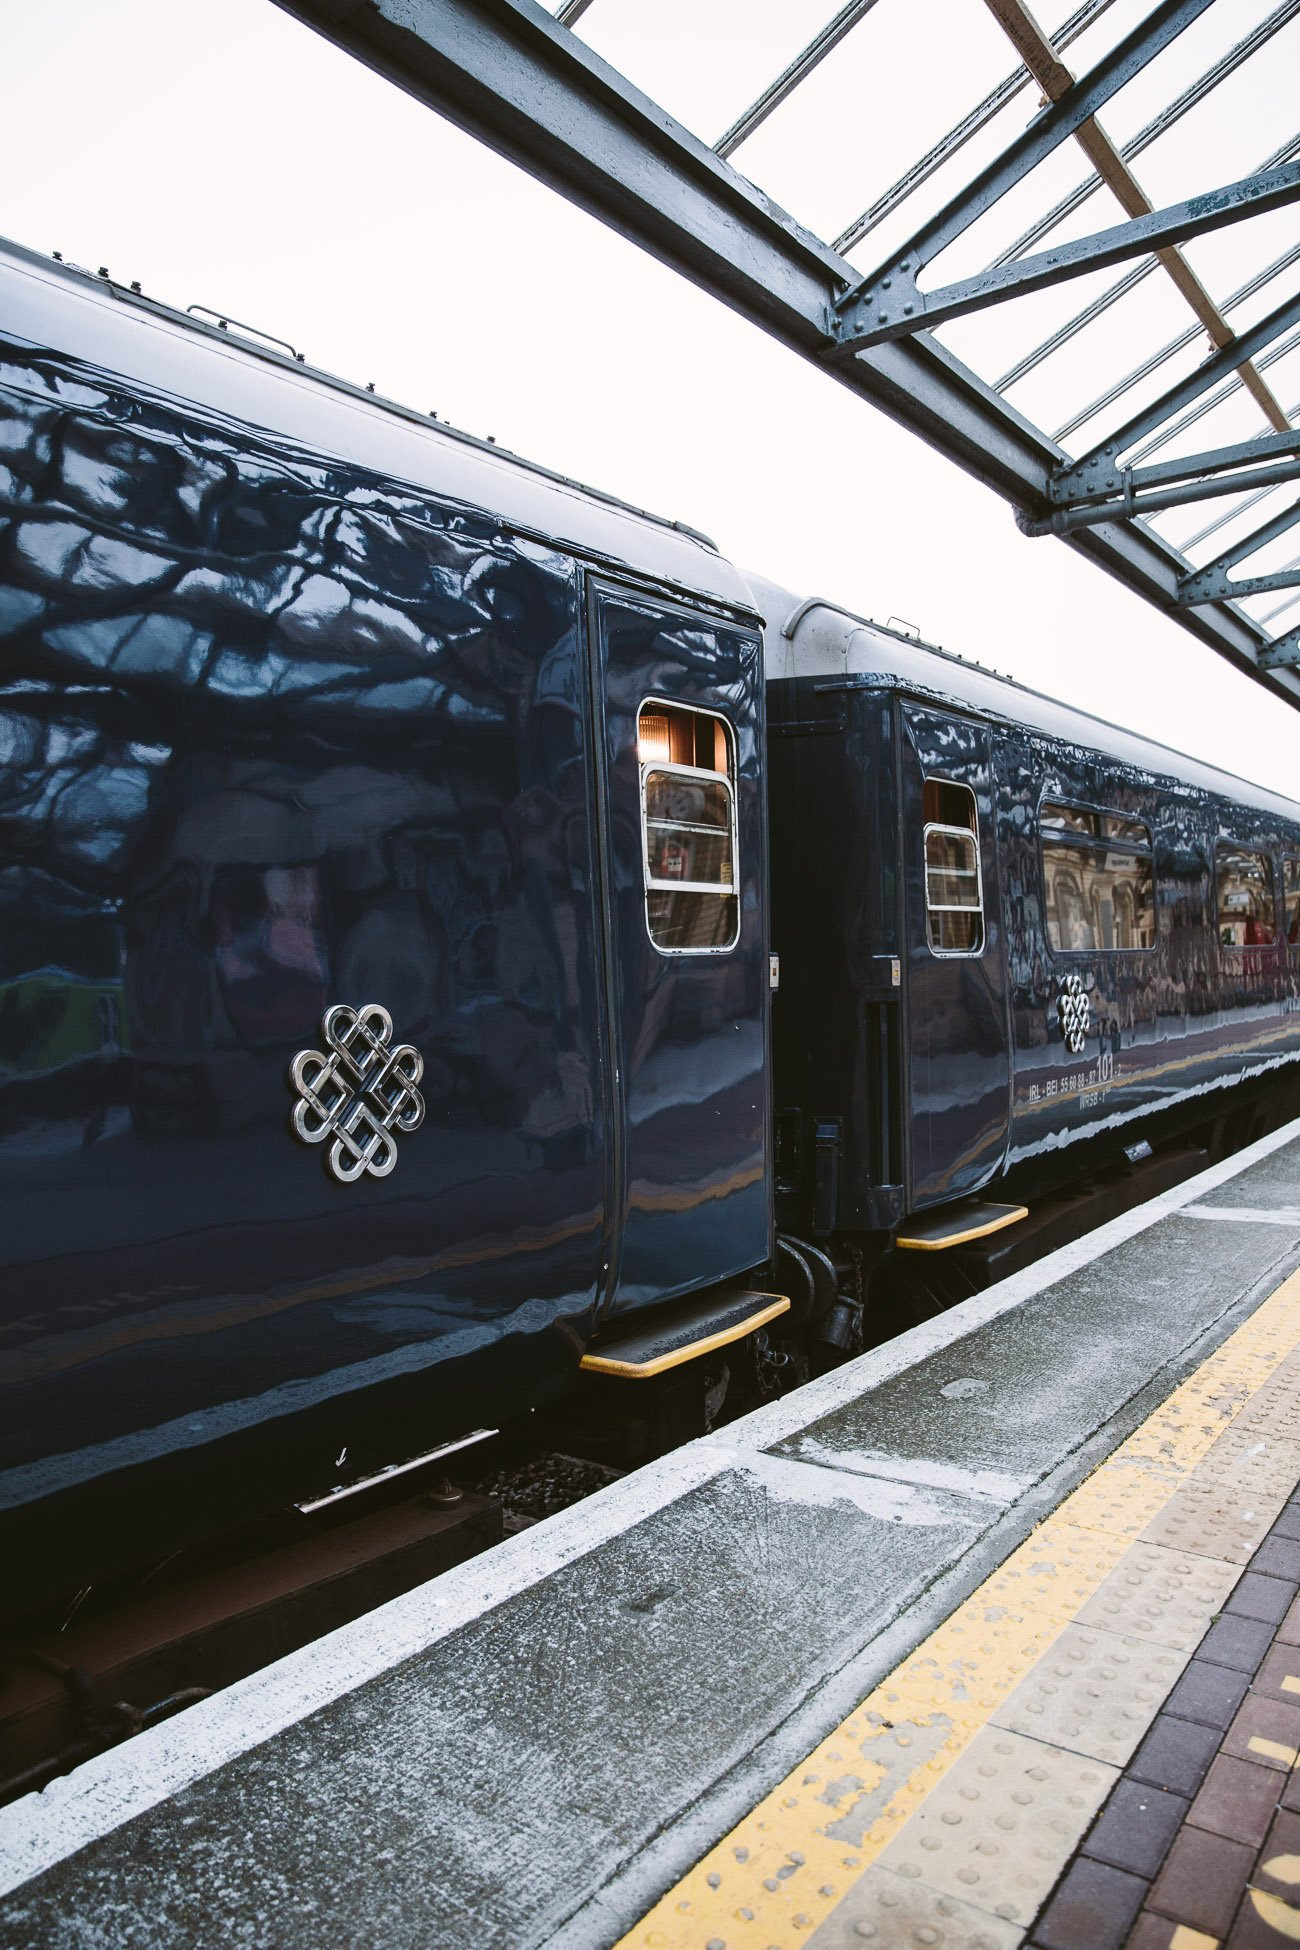 A luxury train journey through Ireland